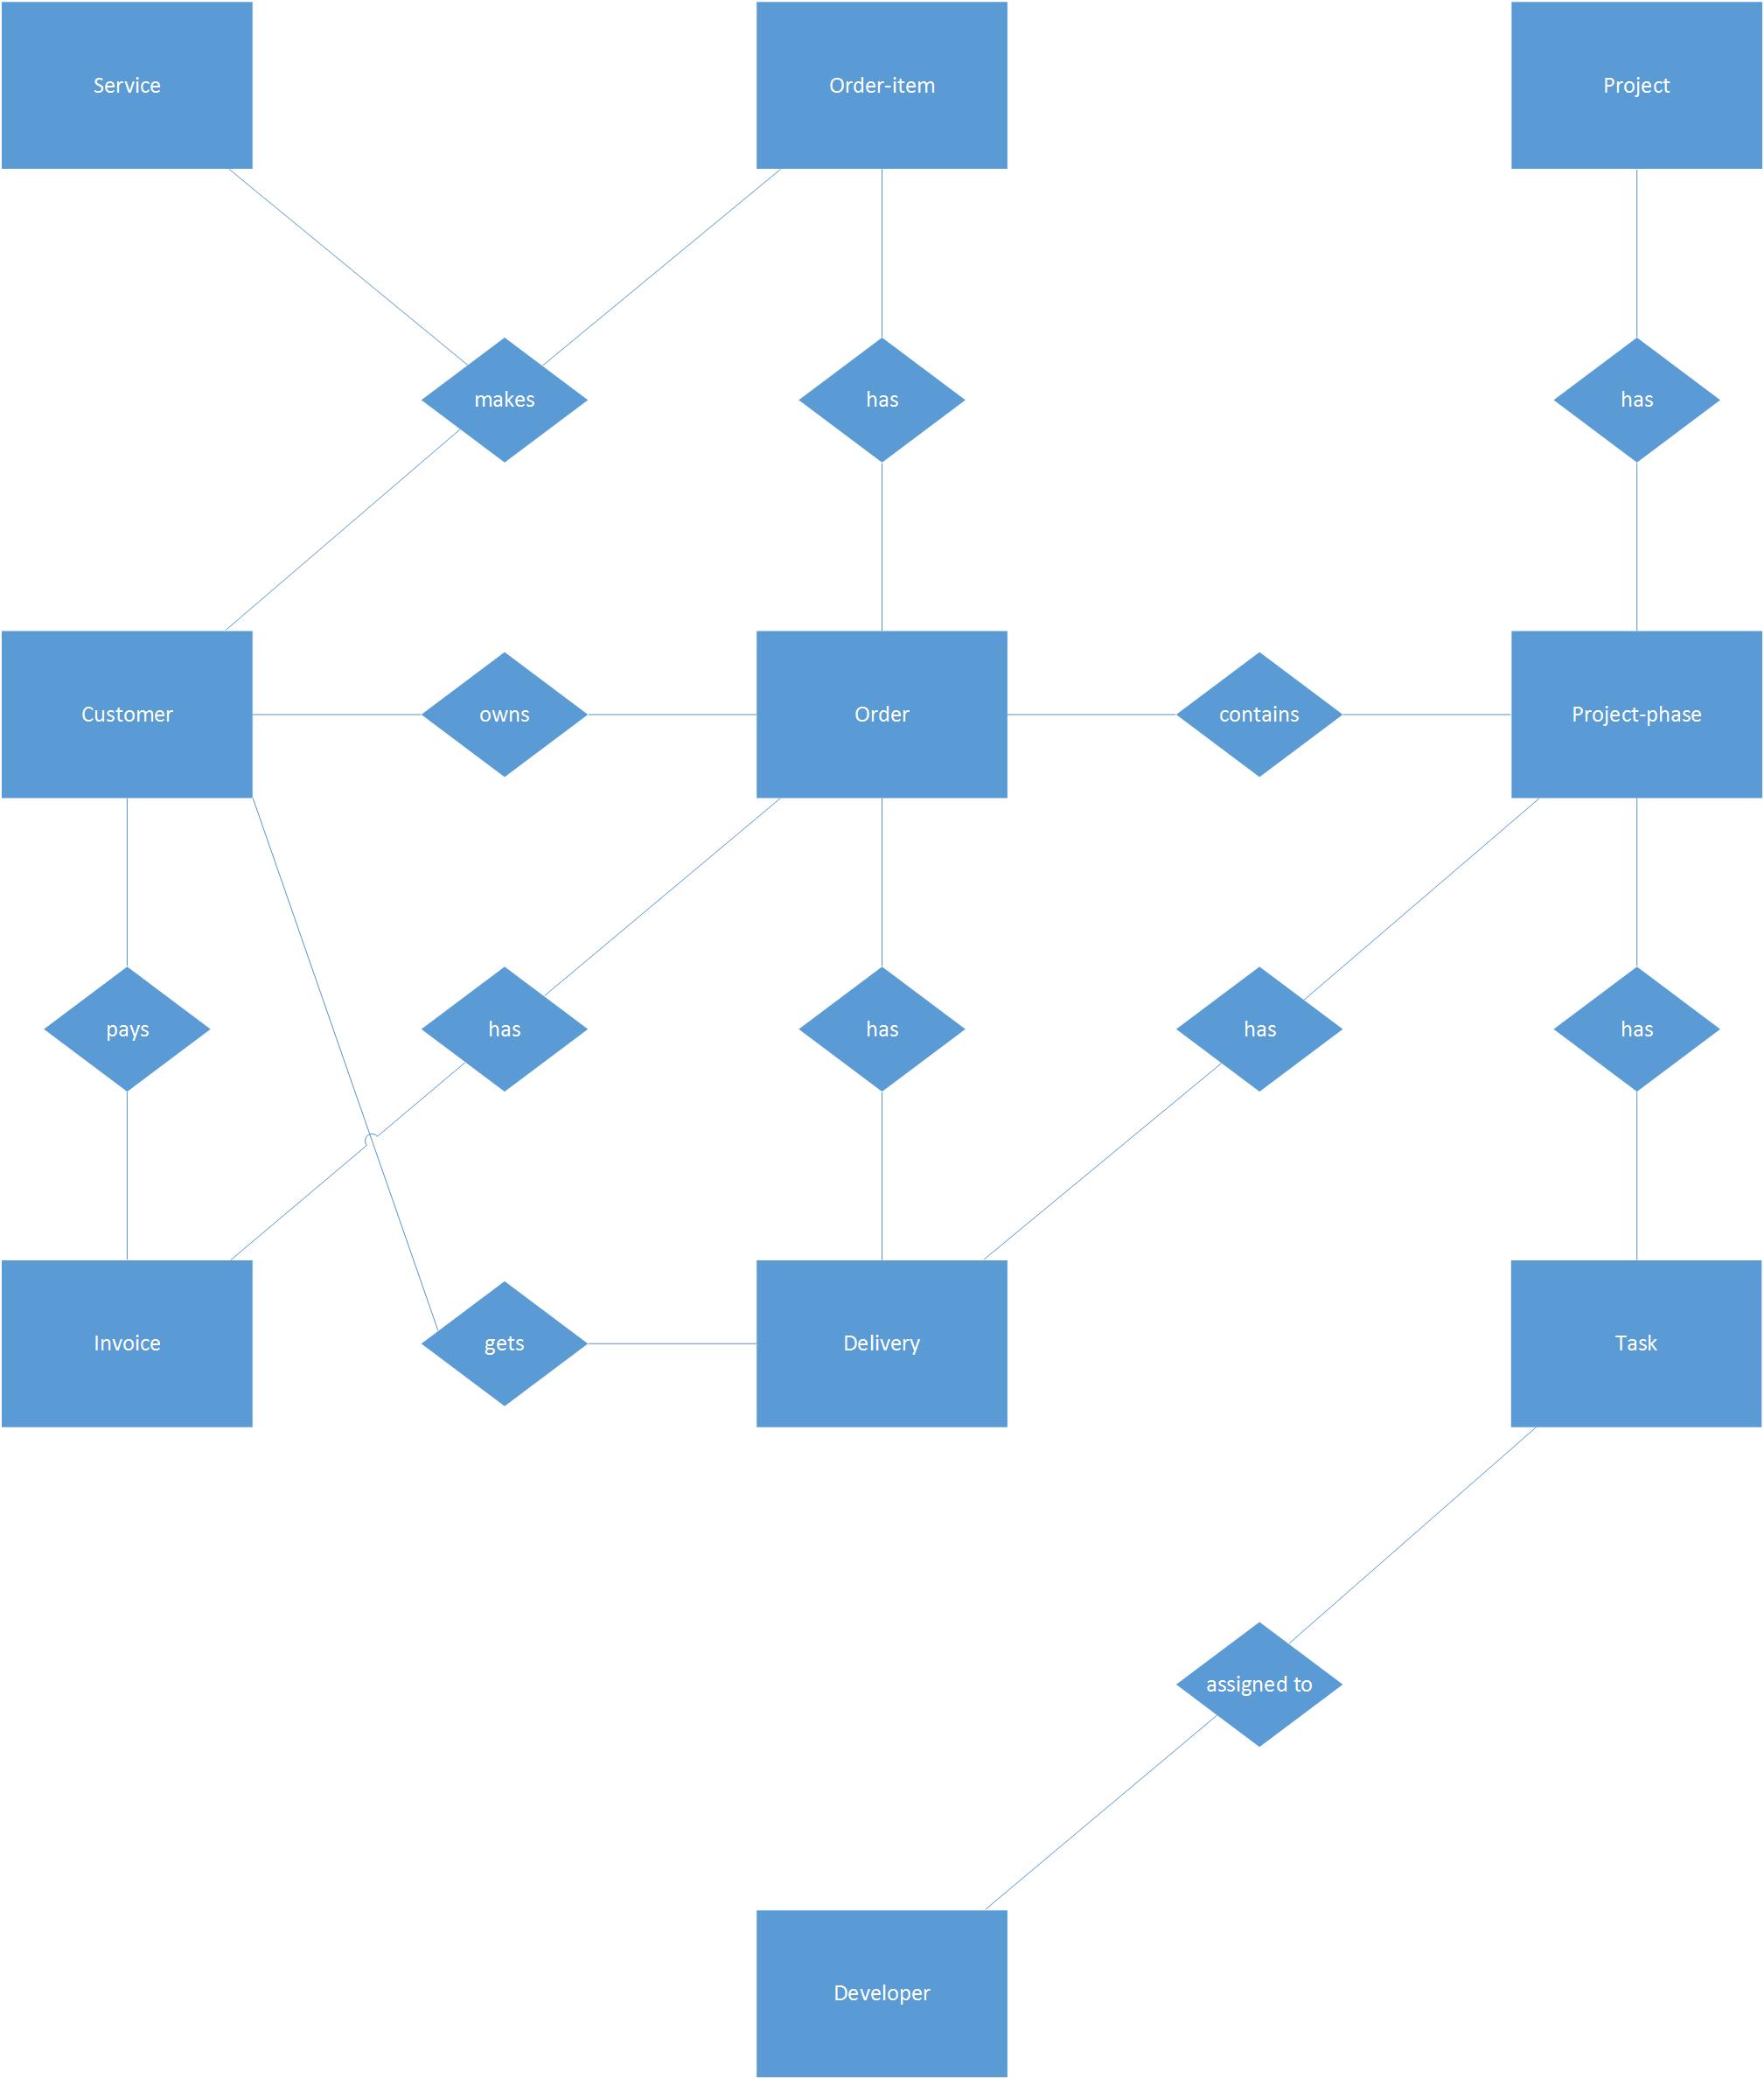 Erd For A Web Development Company - Database Administrators